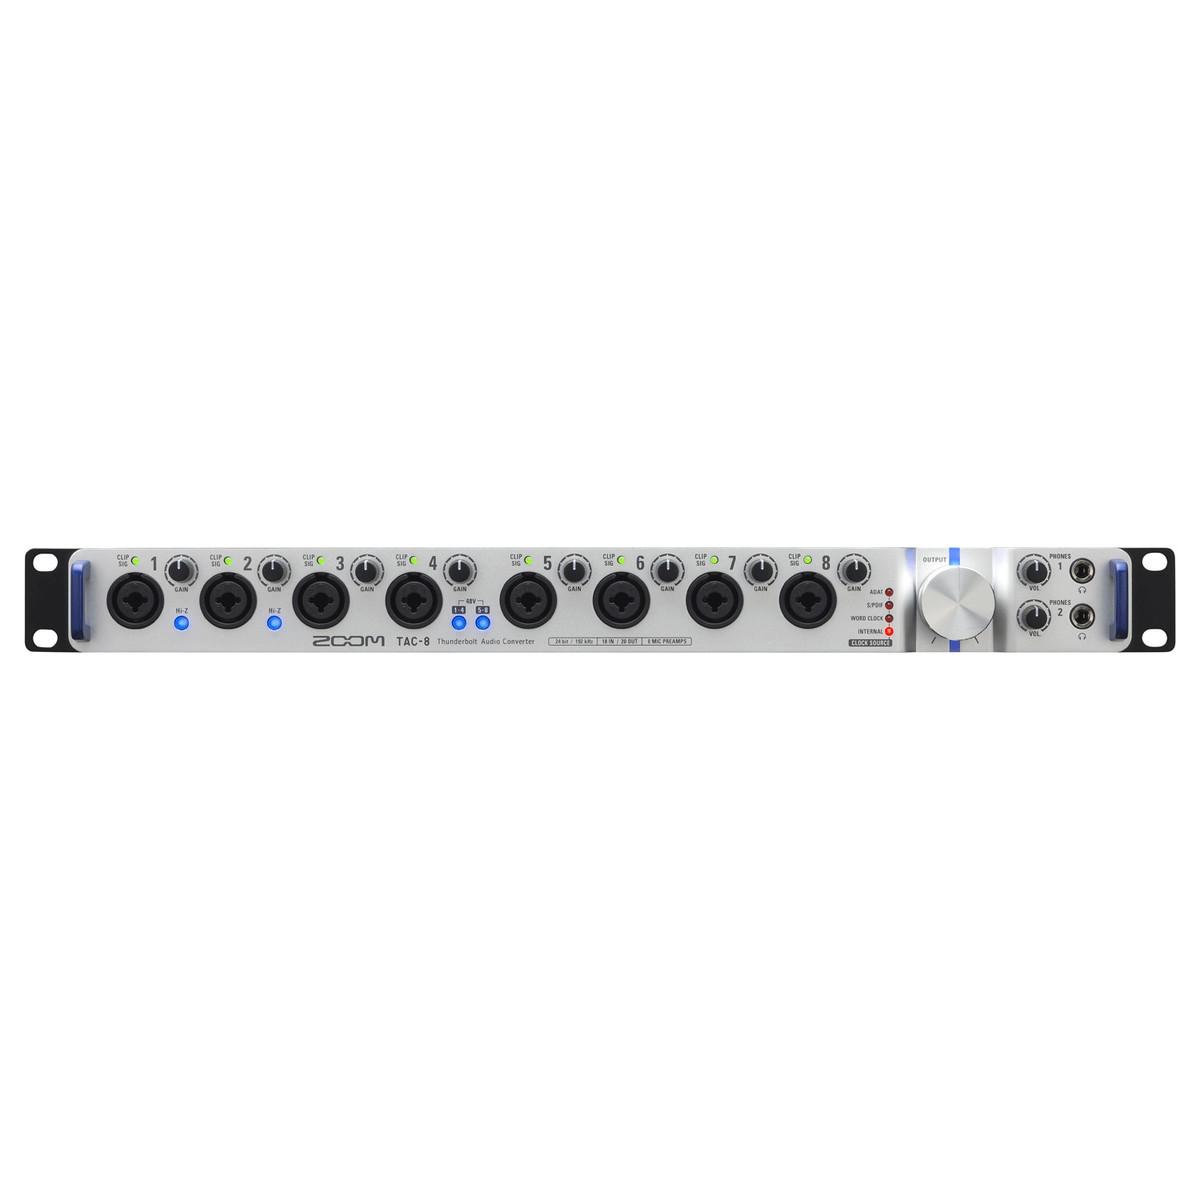 zoom tac 8 thunderbolt audio interface at gear4music. Black Bedroom Furniture Sets. Home Design Ideas